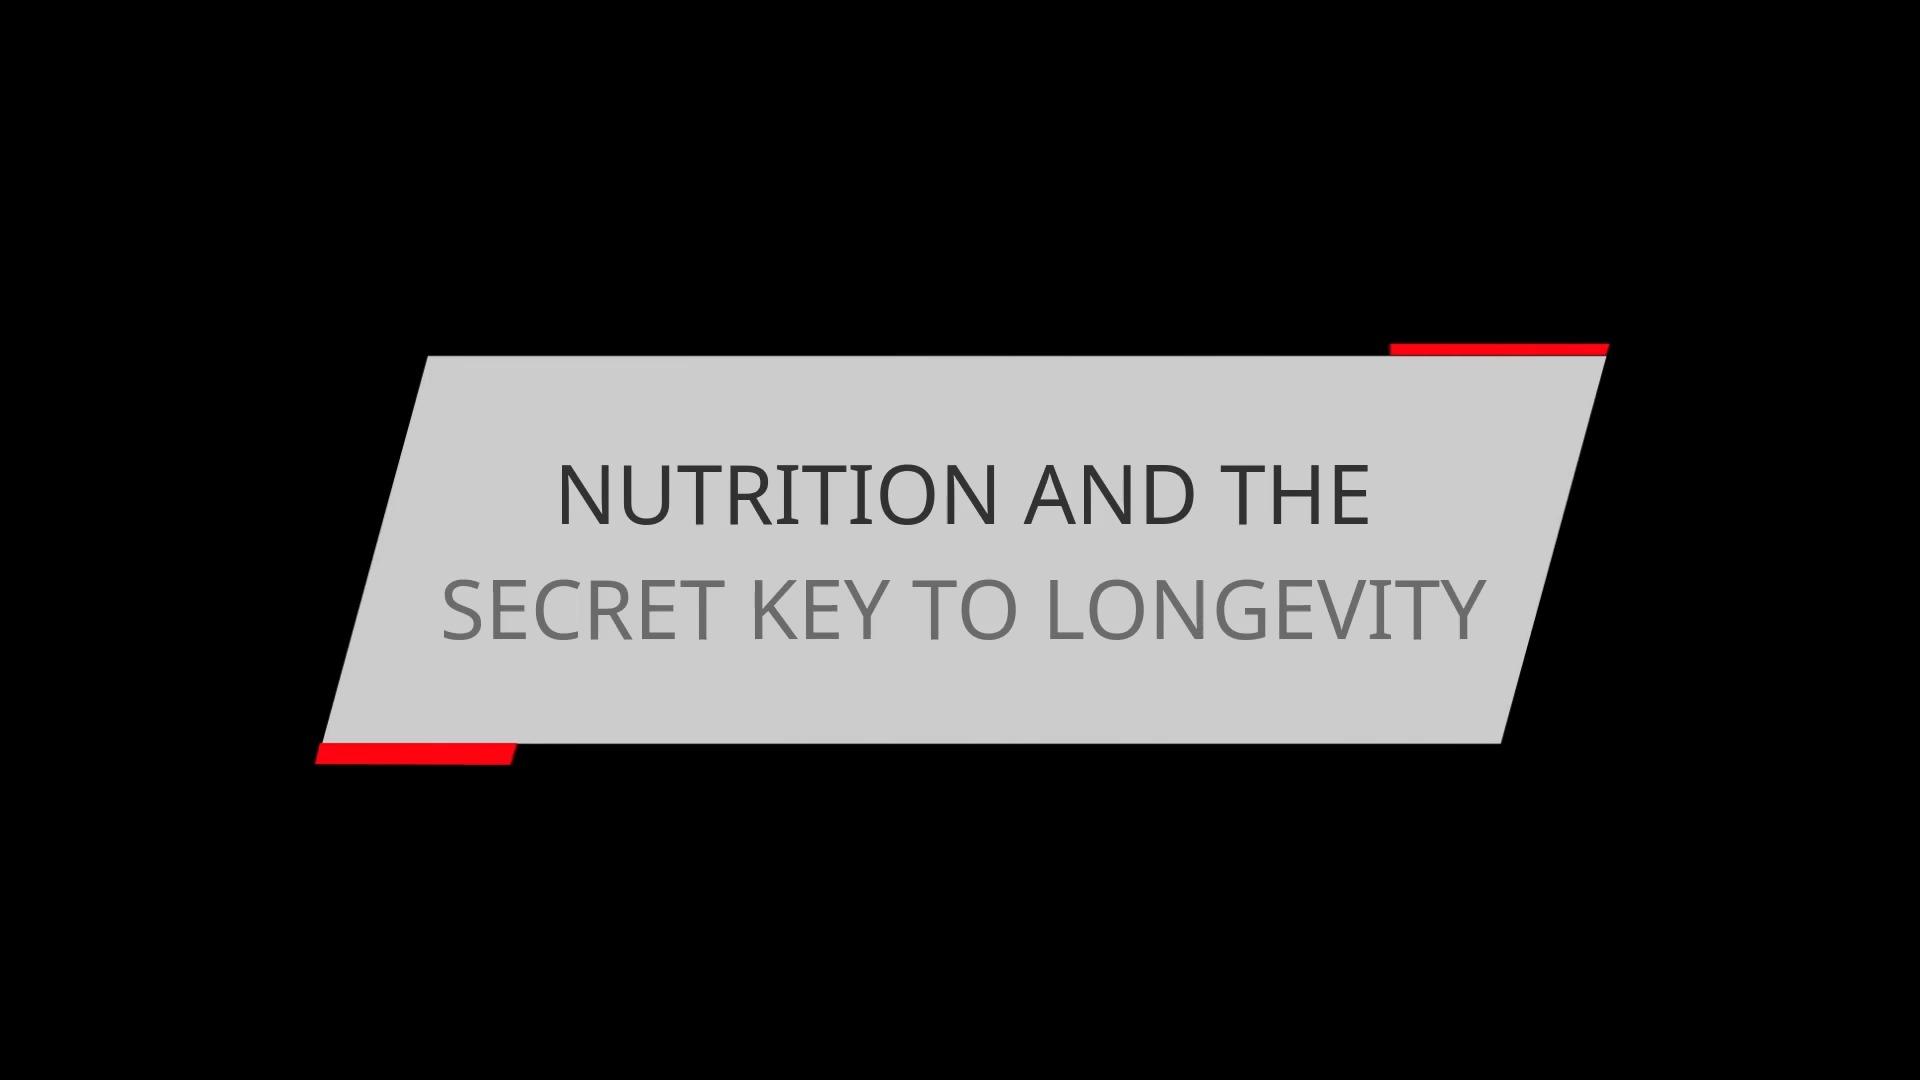 NUTRITION AND THE SECRET KEY TO LONGEVITY